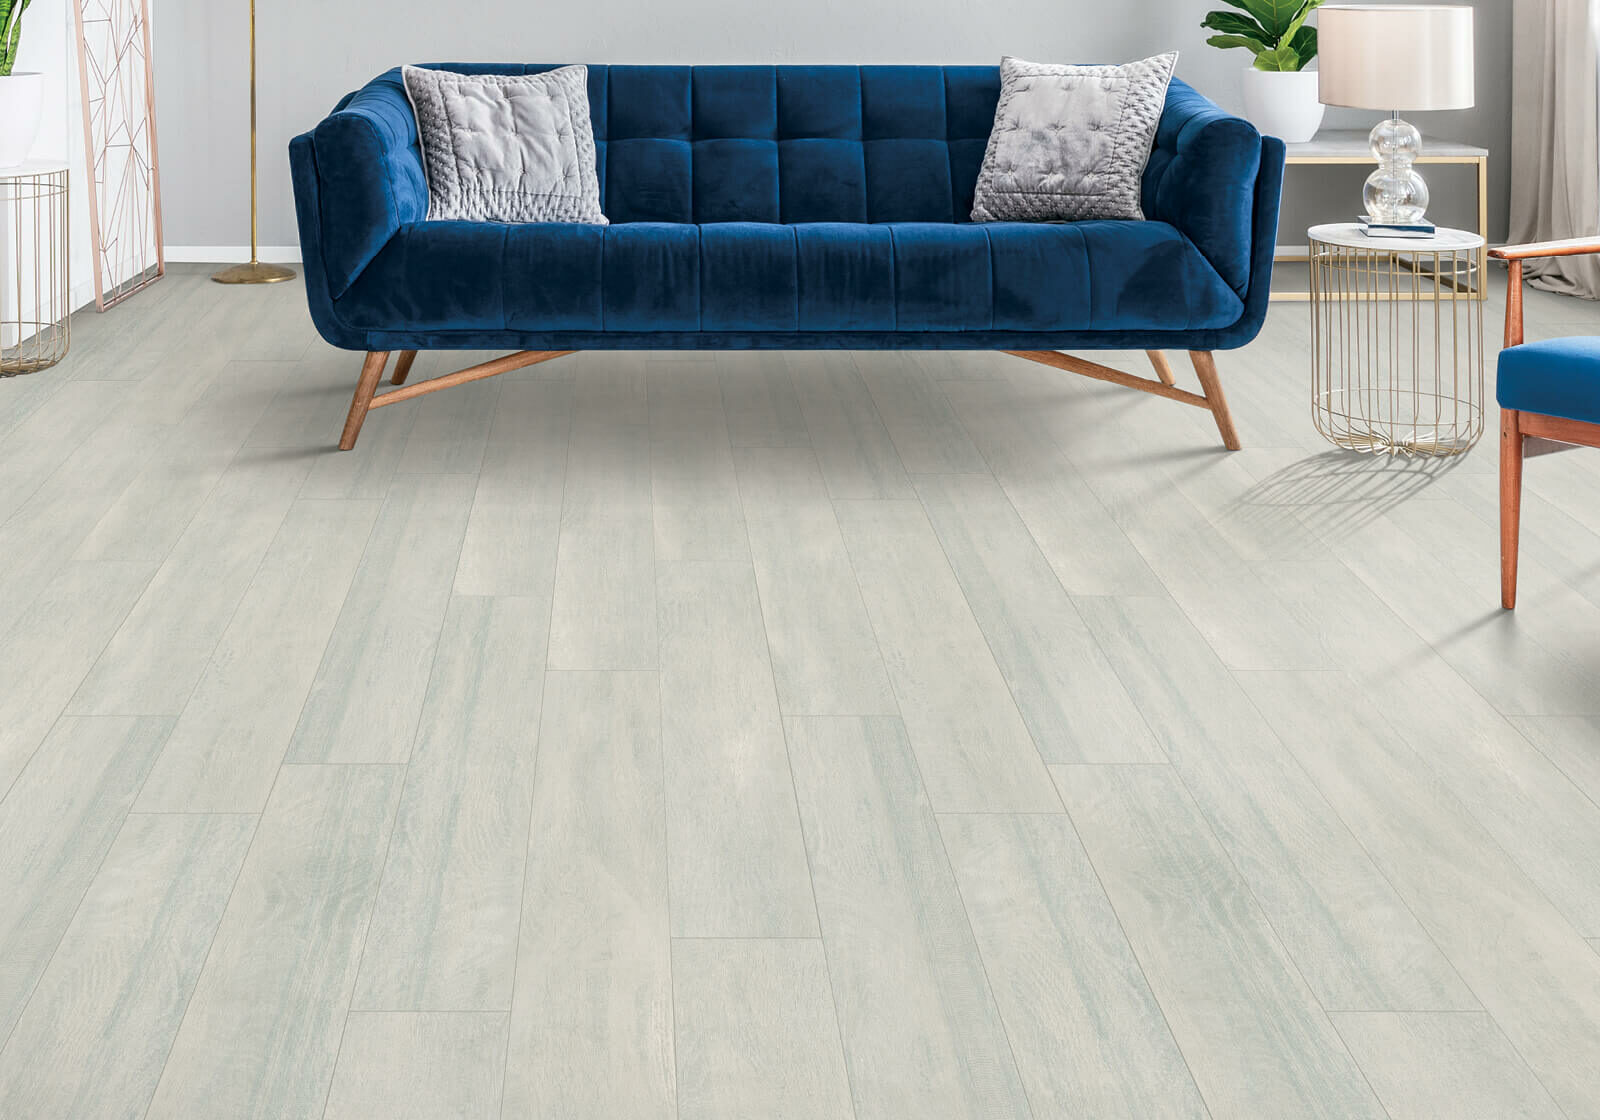 Mohawk | Dolphin Carpet & Tile